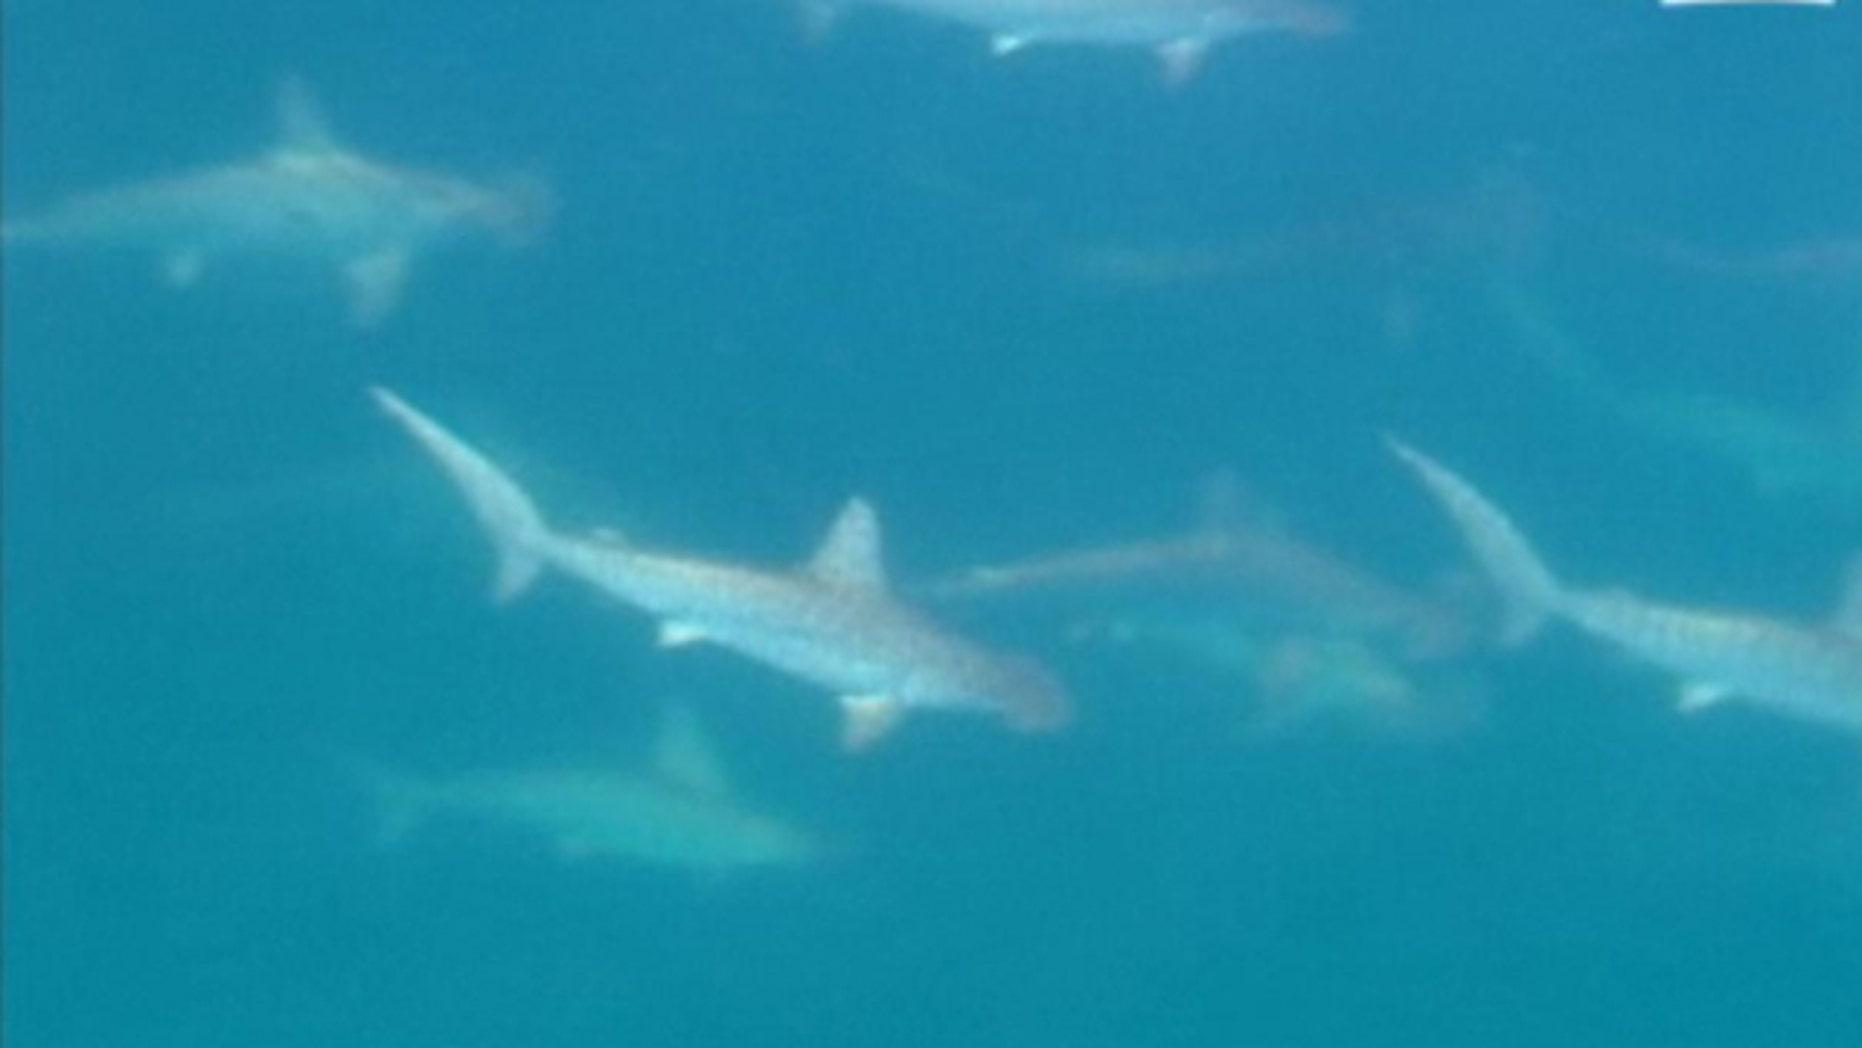 A screen capture of the rare hammerhead shark mating ritual, caught on camera by an Australian news team.